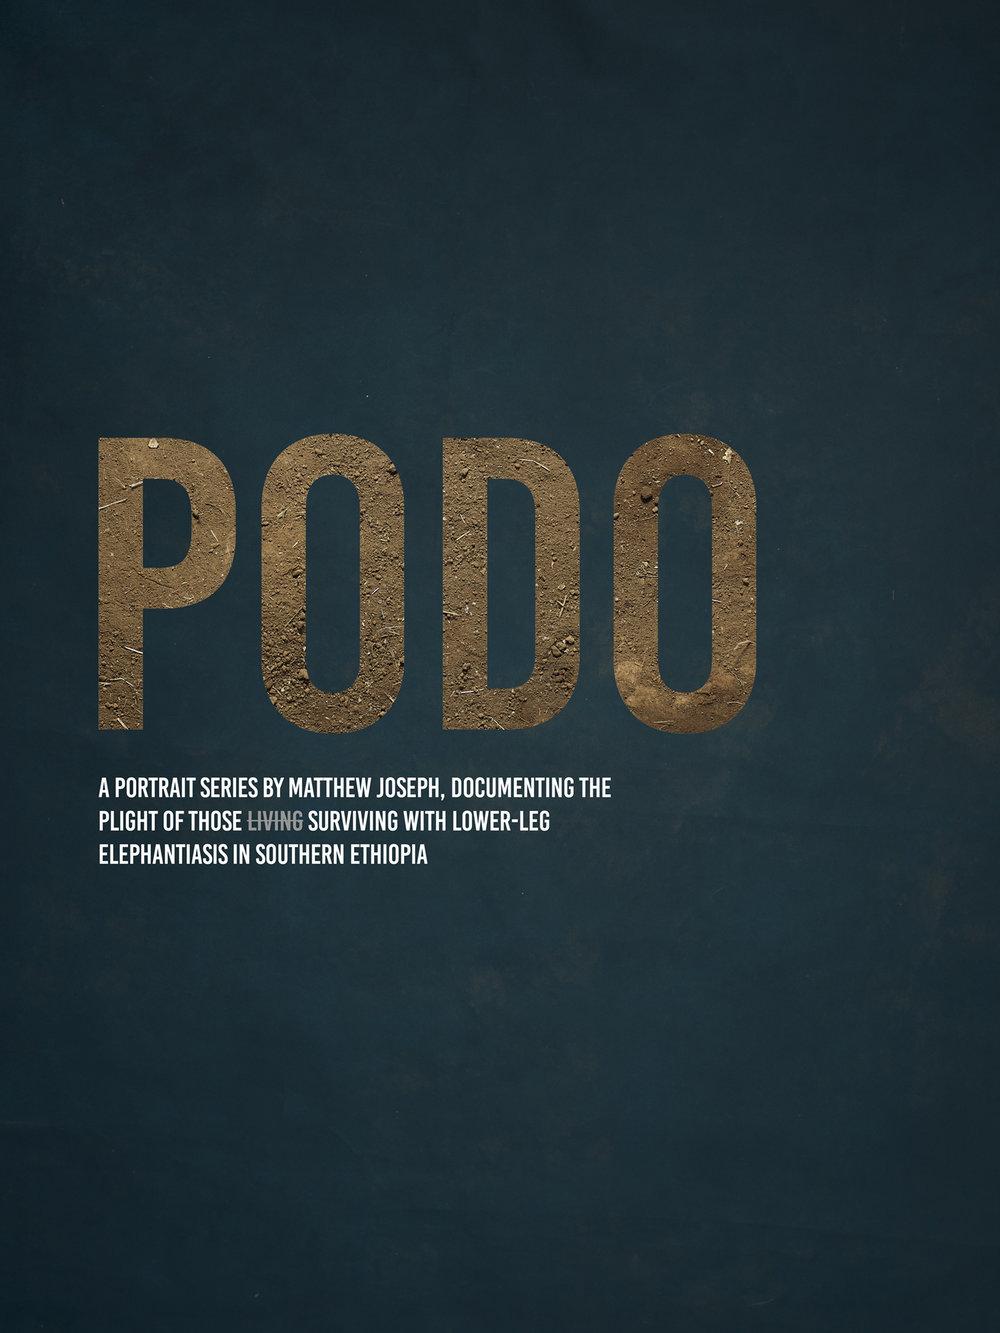 PODO exhibition Matthew Joseph